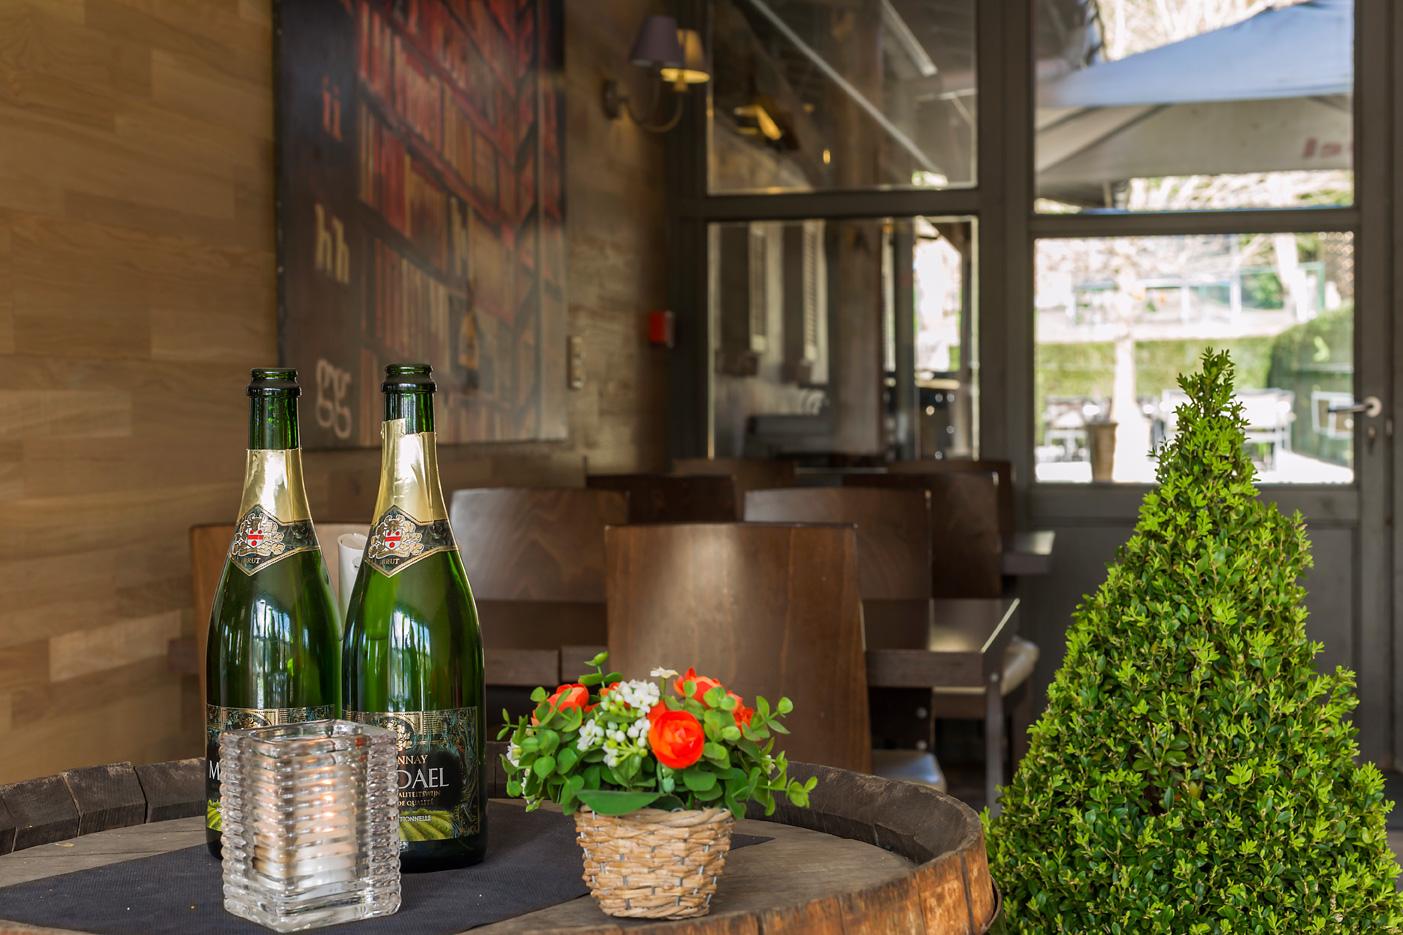 Brasserie-Bleu-Blanc-in-Oud-Heverlee_Bleu_Blanc_DSC2443_150227